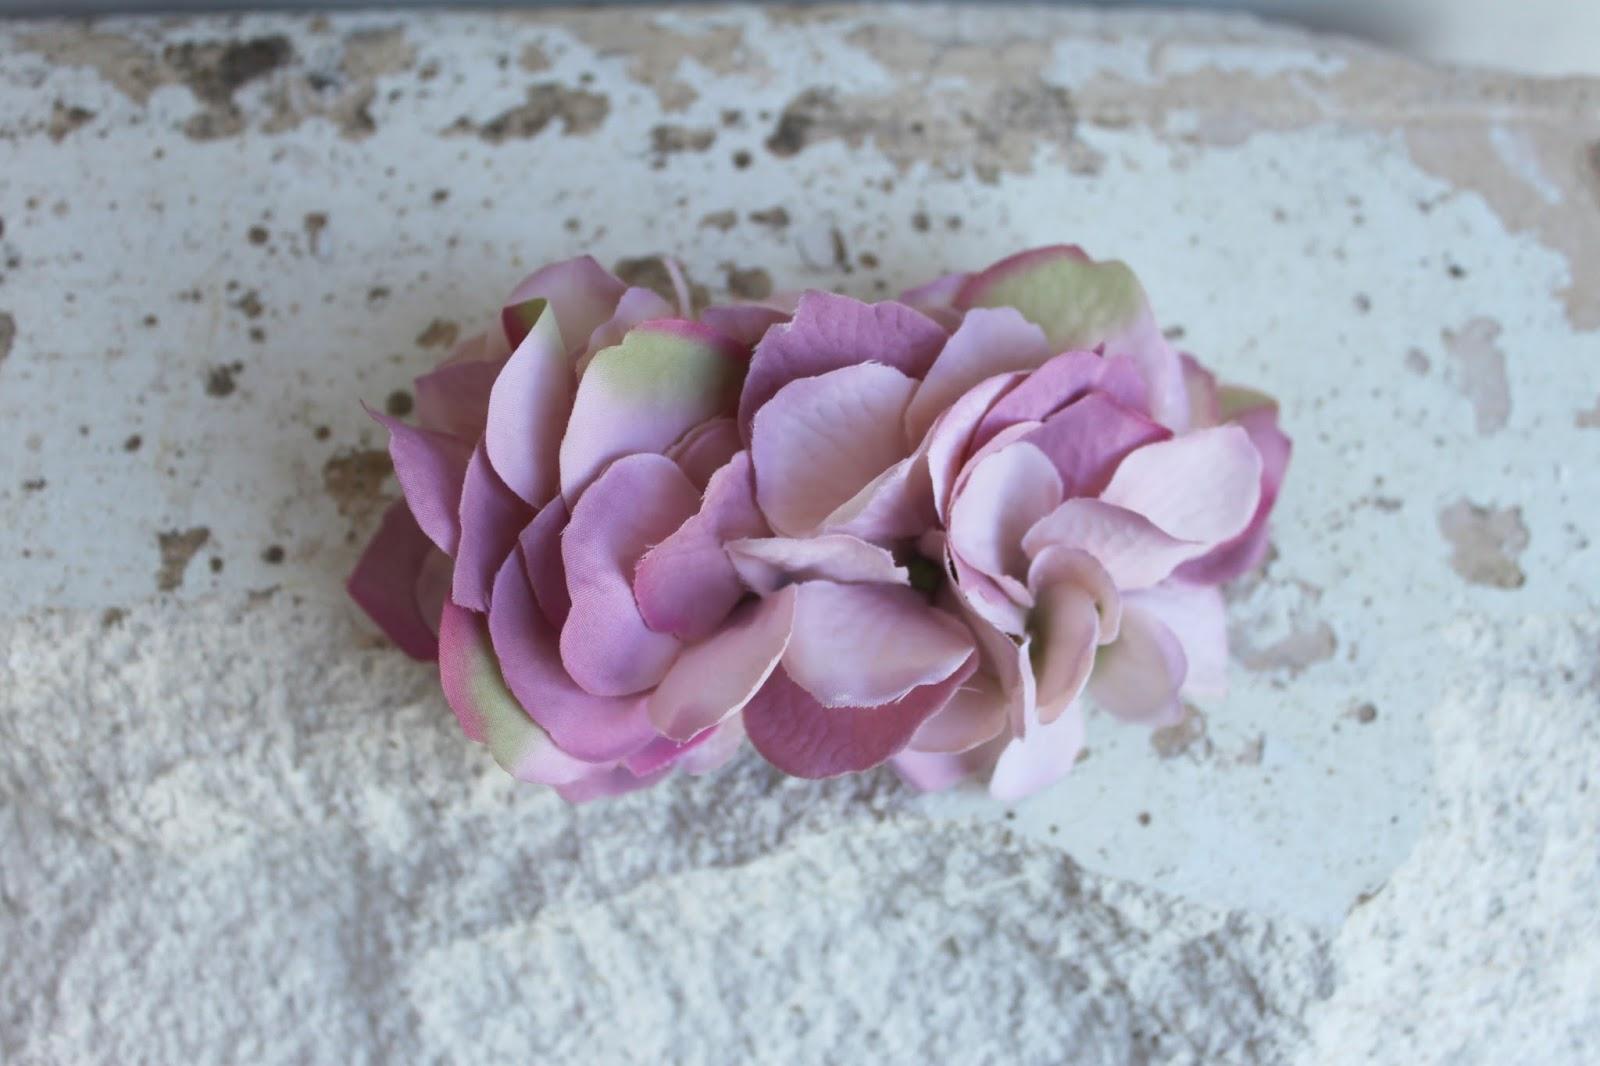 pasador clair hortensias de tela en varios tonos de rosa